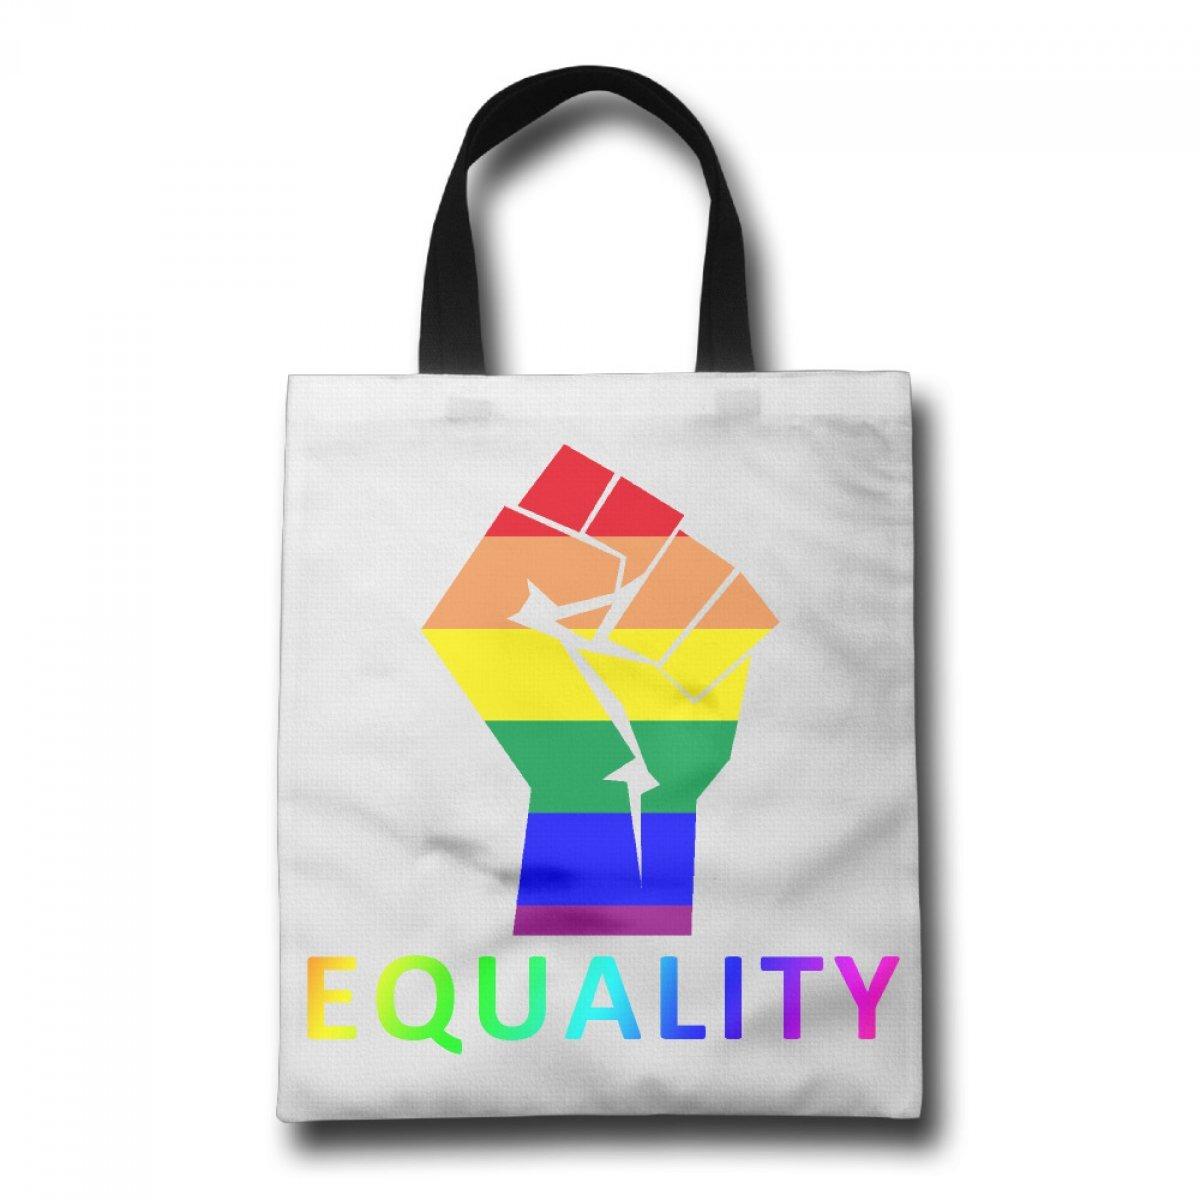 PhoRock Women Canvas Tote Bag Printing Equality Image Handbag Leisure School Books Bag GWRB002 0